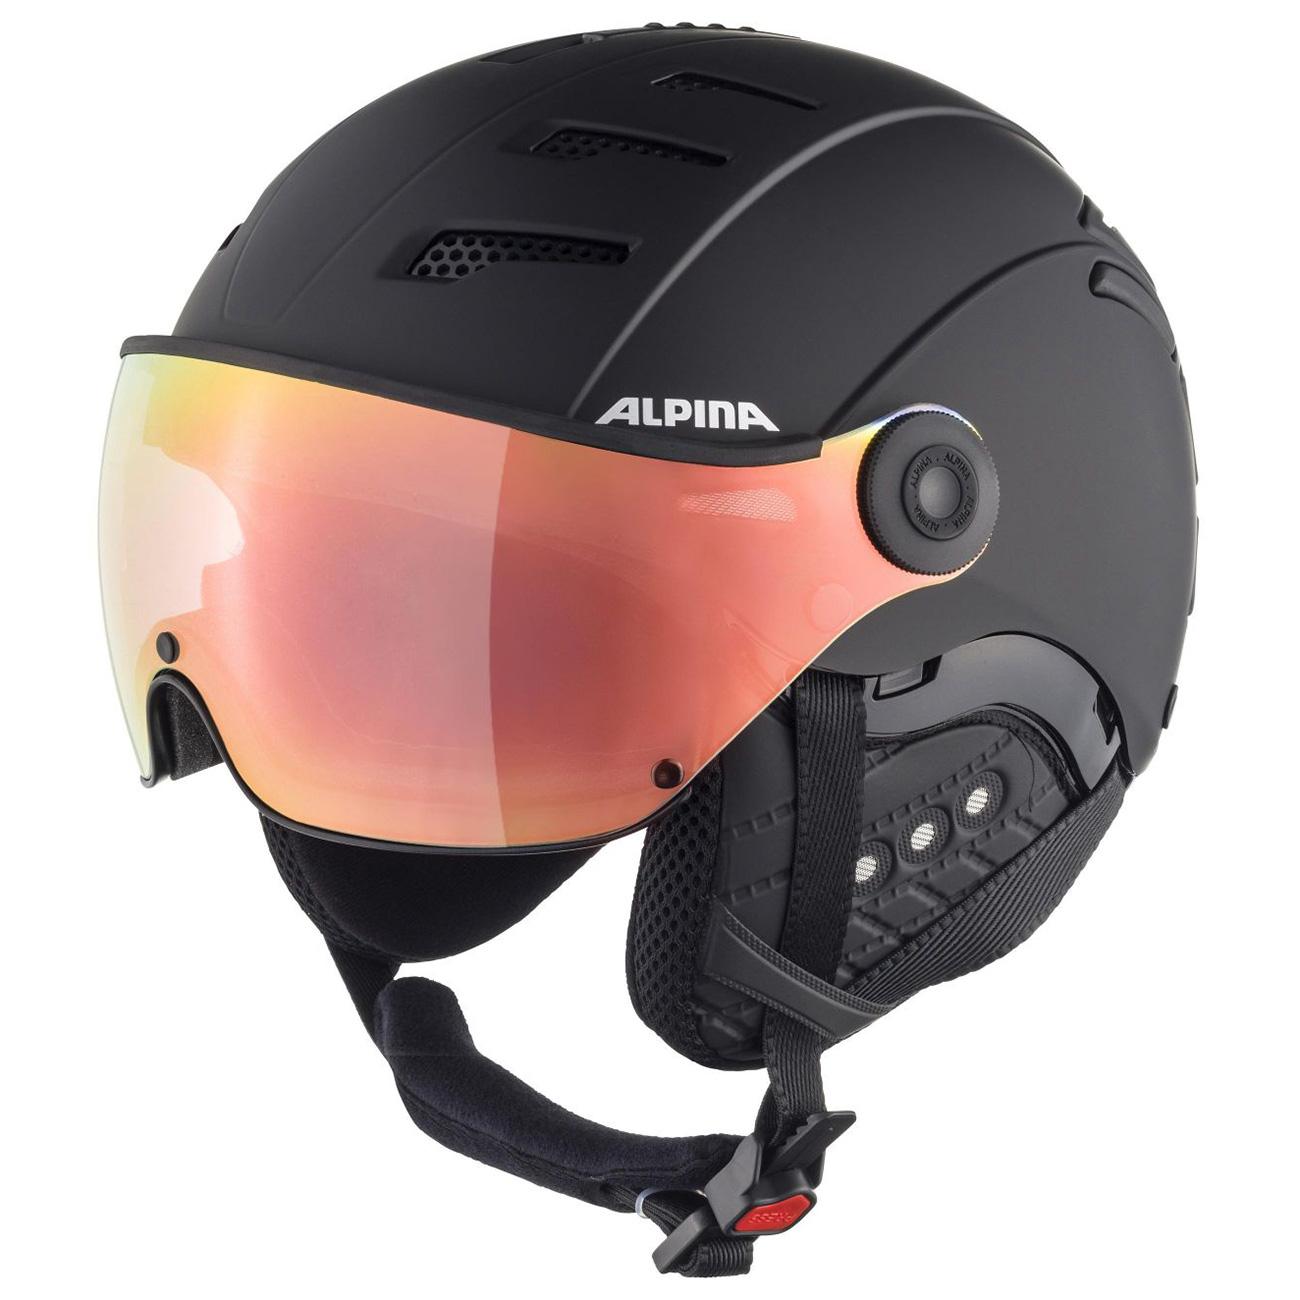 Alpina Jump 2.0 HM S1 Skihelm mit Visier black matt 59 - 61 cm